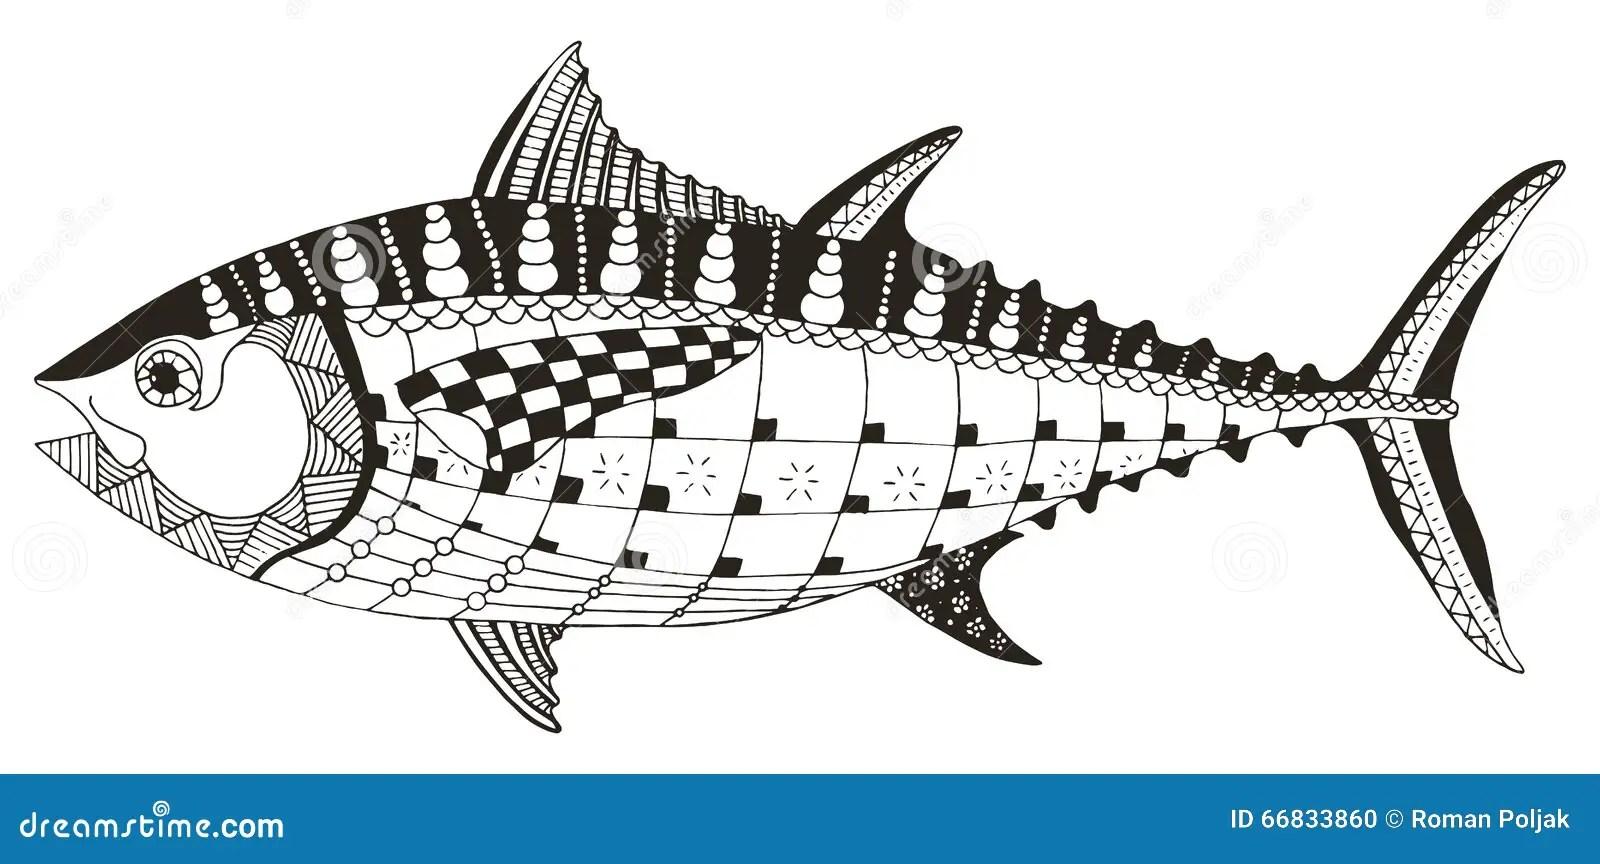 Stylized Elephant Hand Drawn Lace Vector Illustration